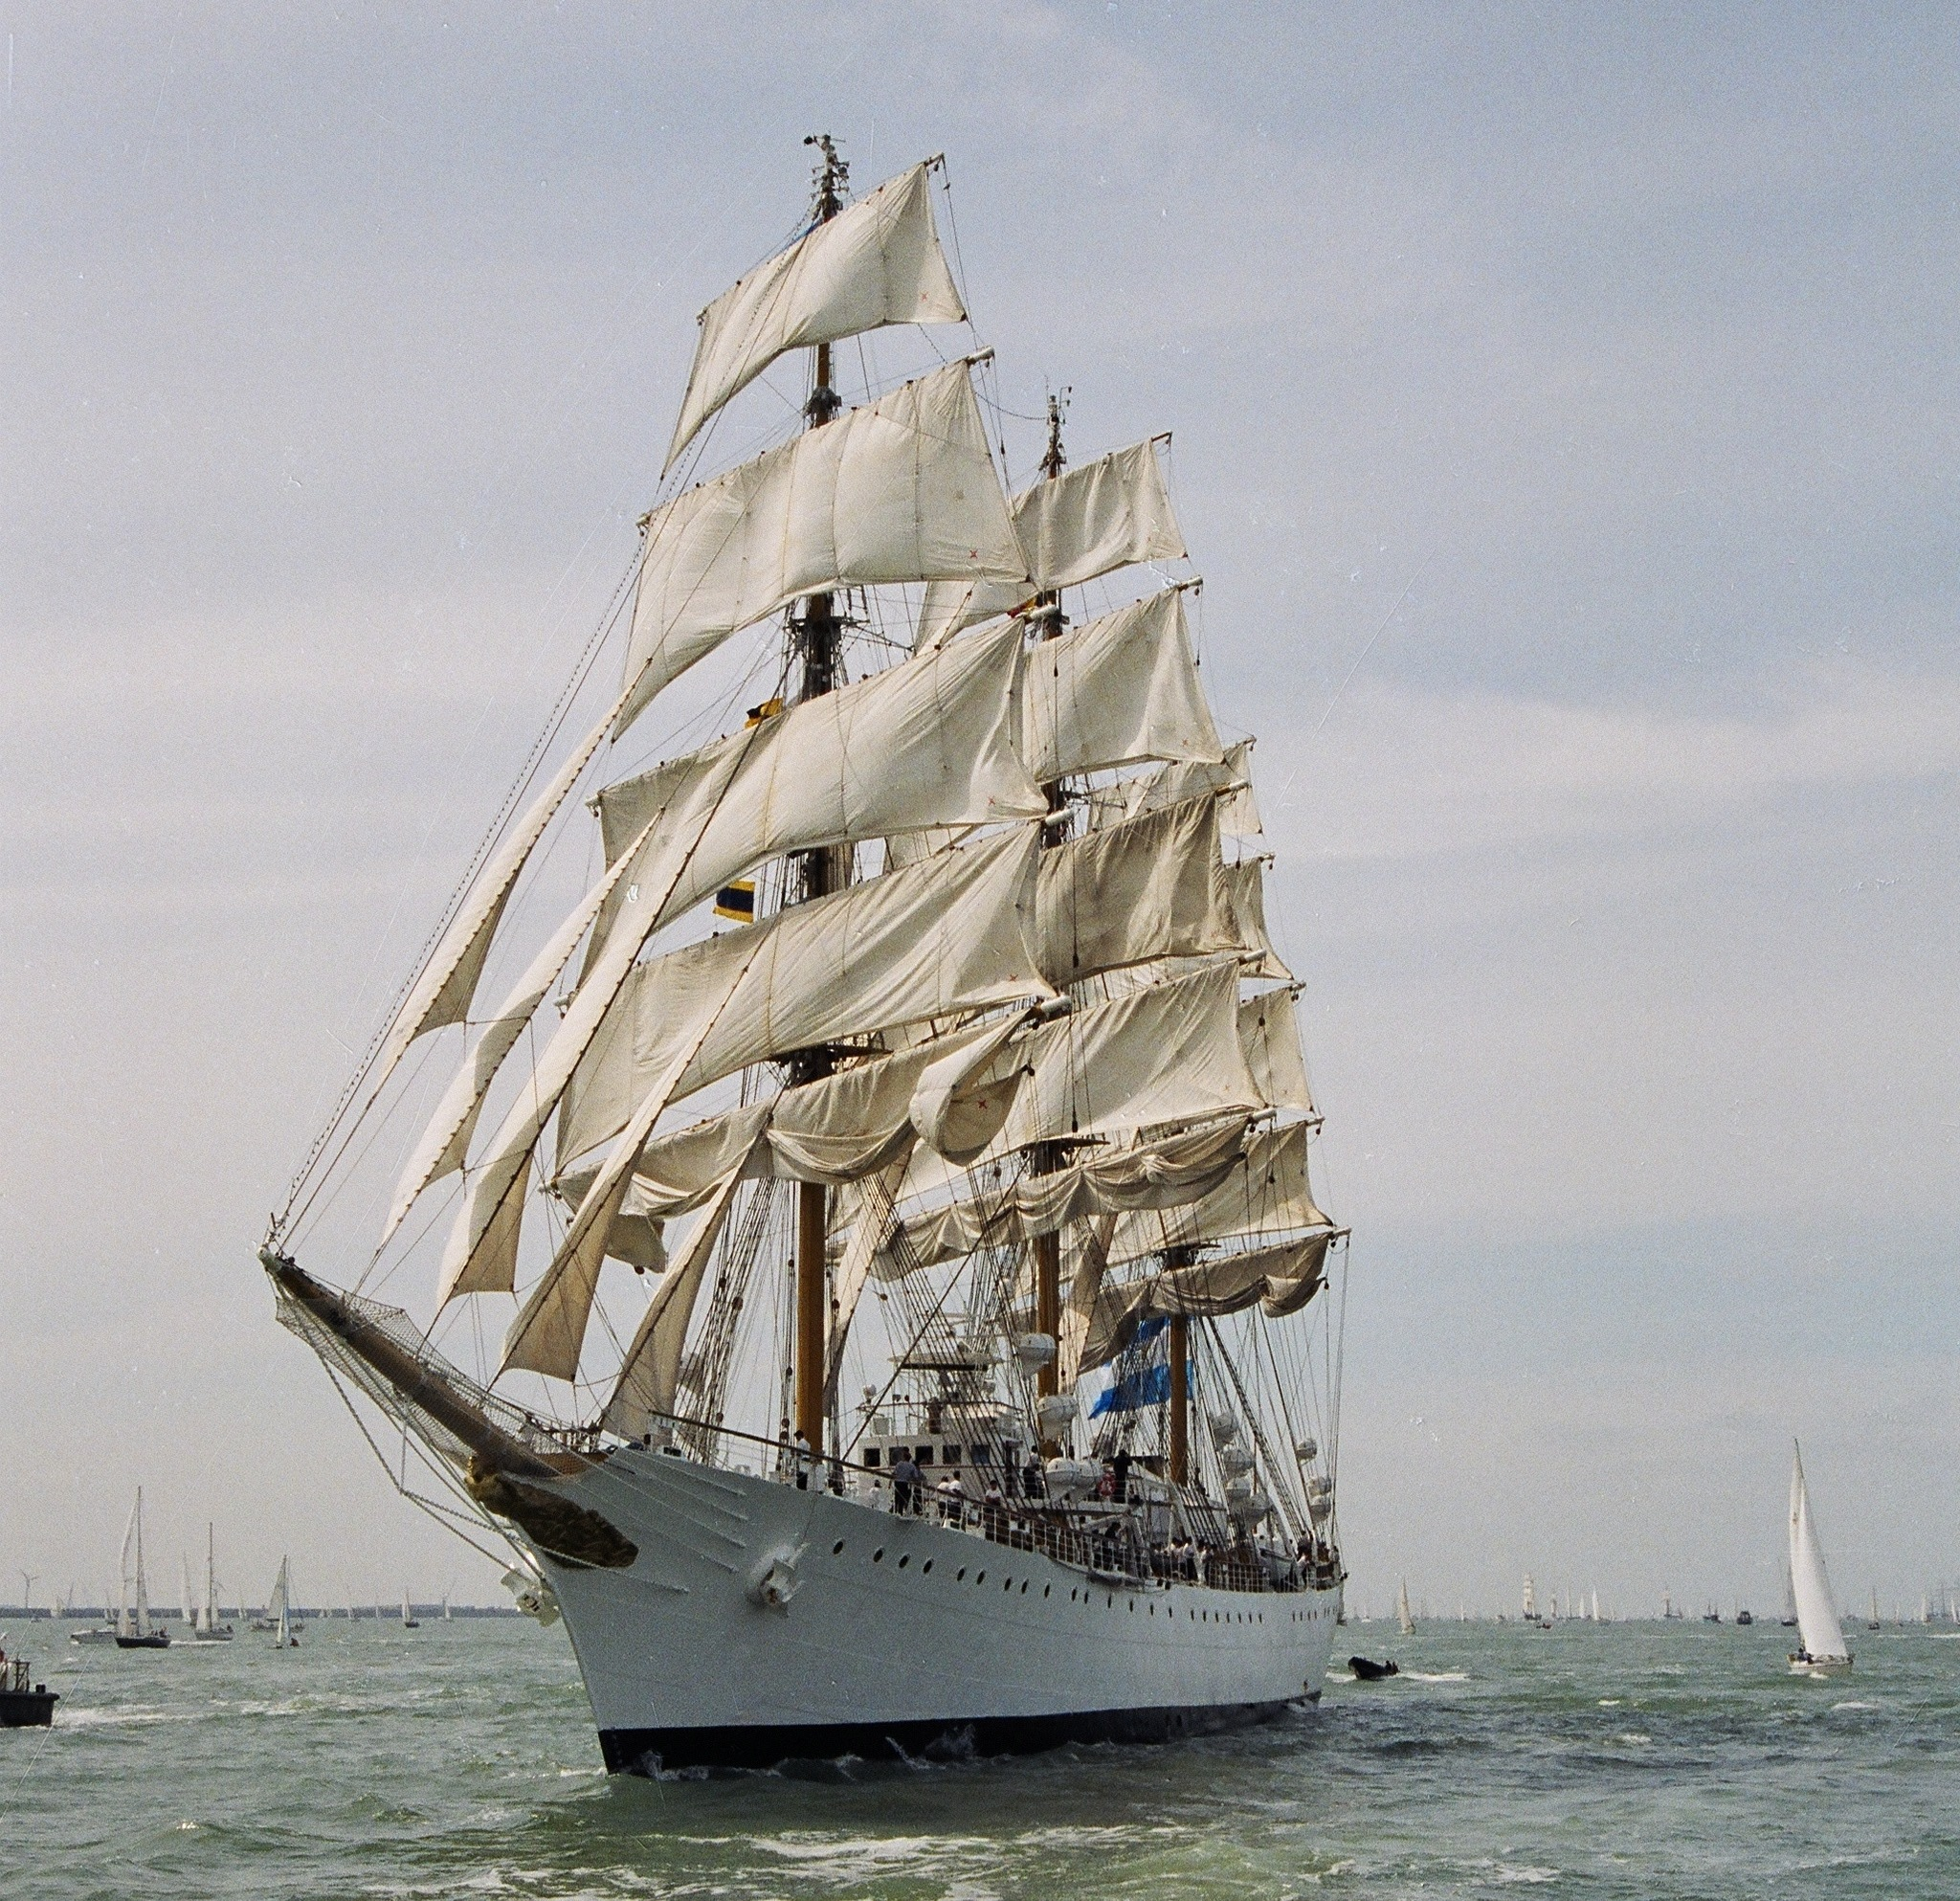 Segelschiff Libertad in voller Fahrt (http://images.google.de)